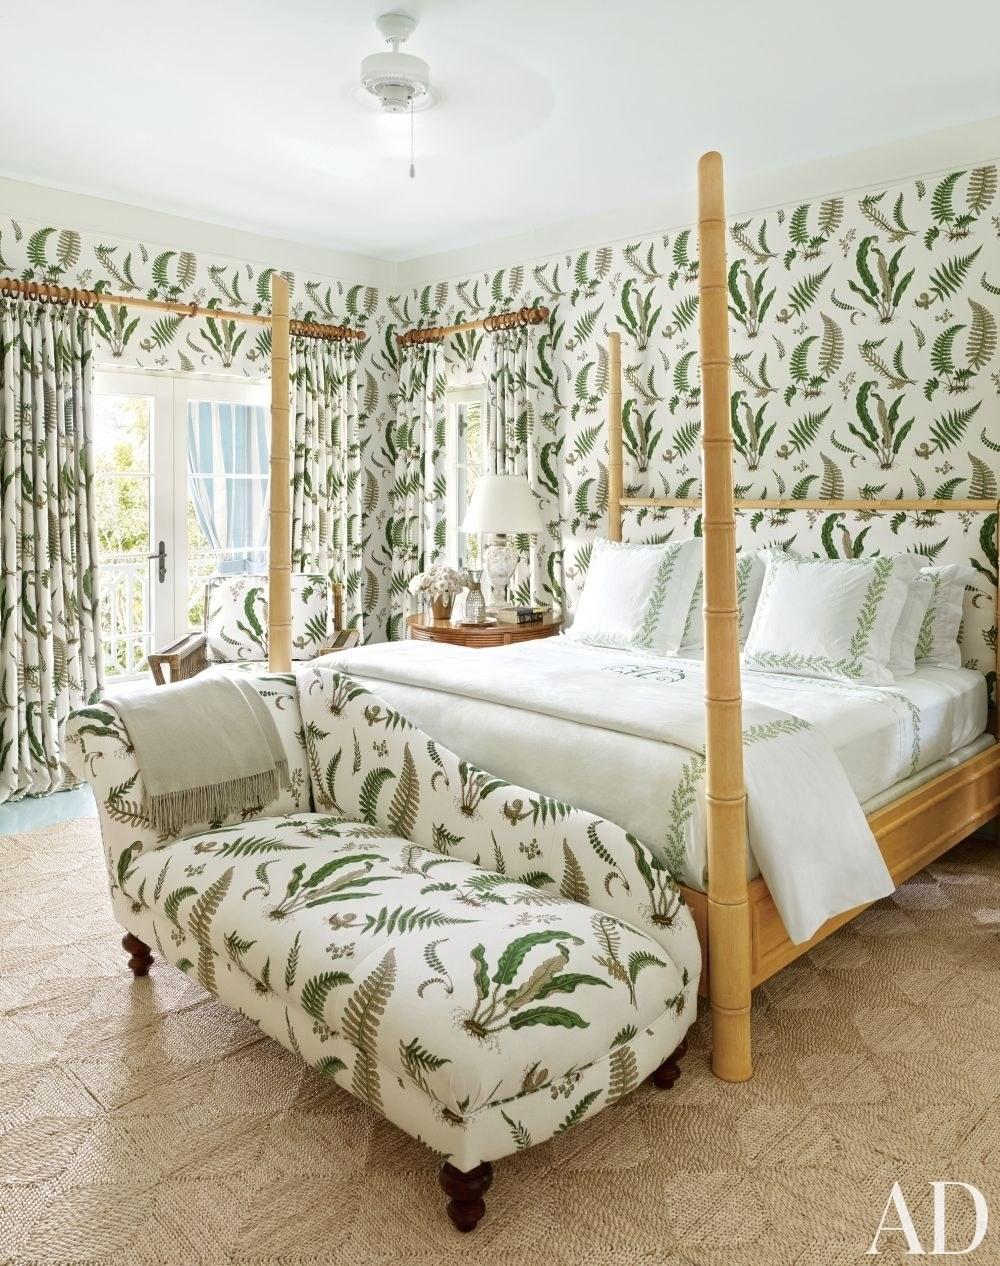 home decor trends 2020, interior decorating 2020